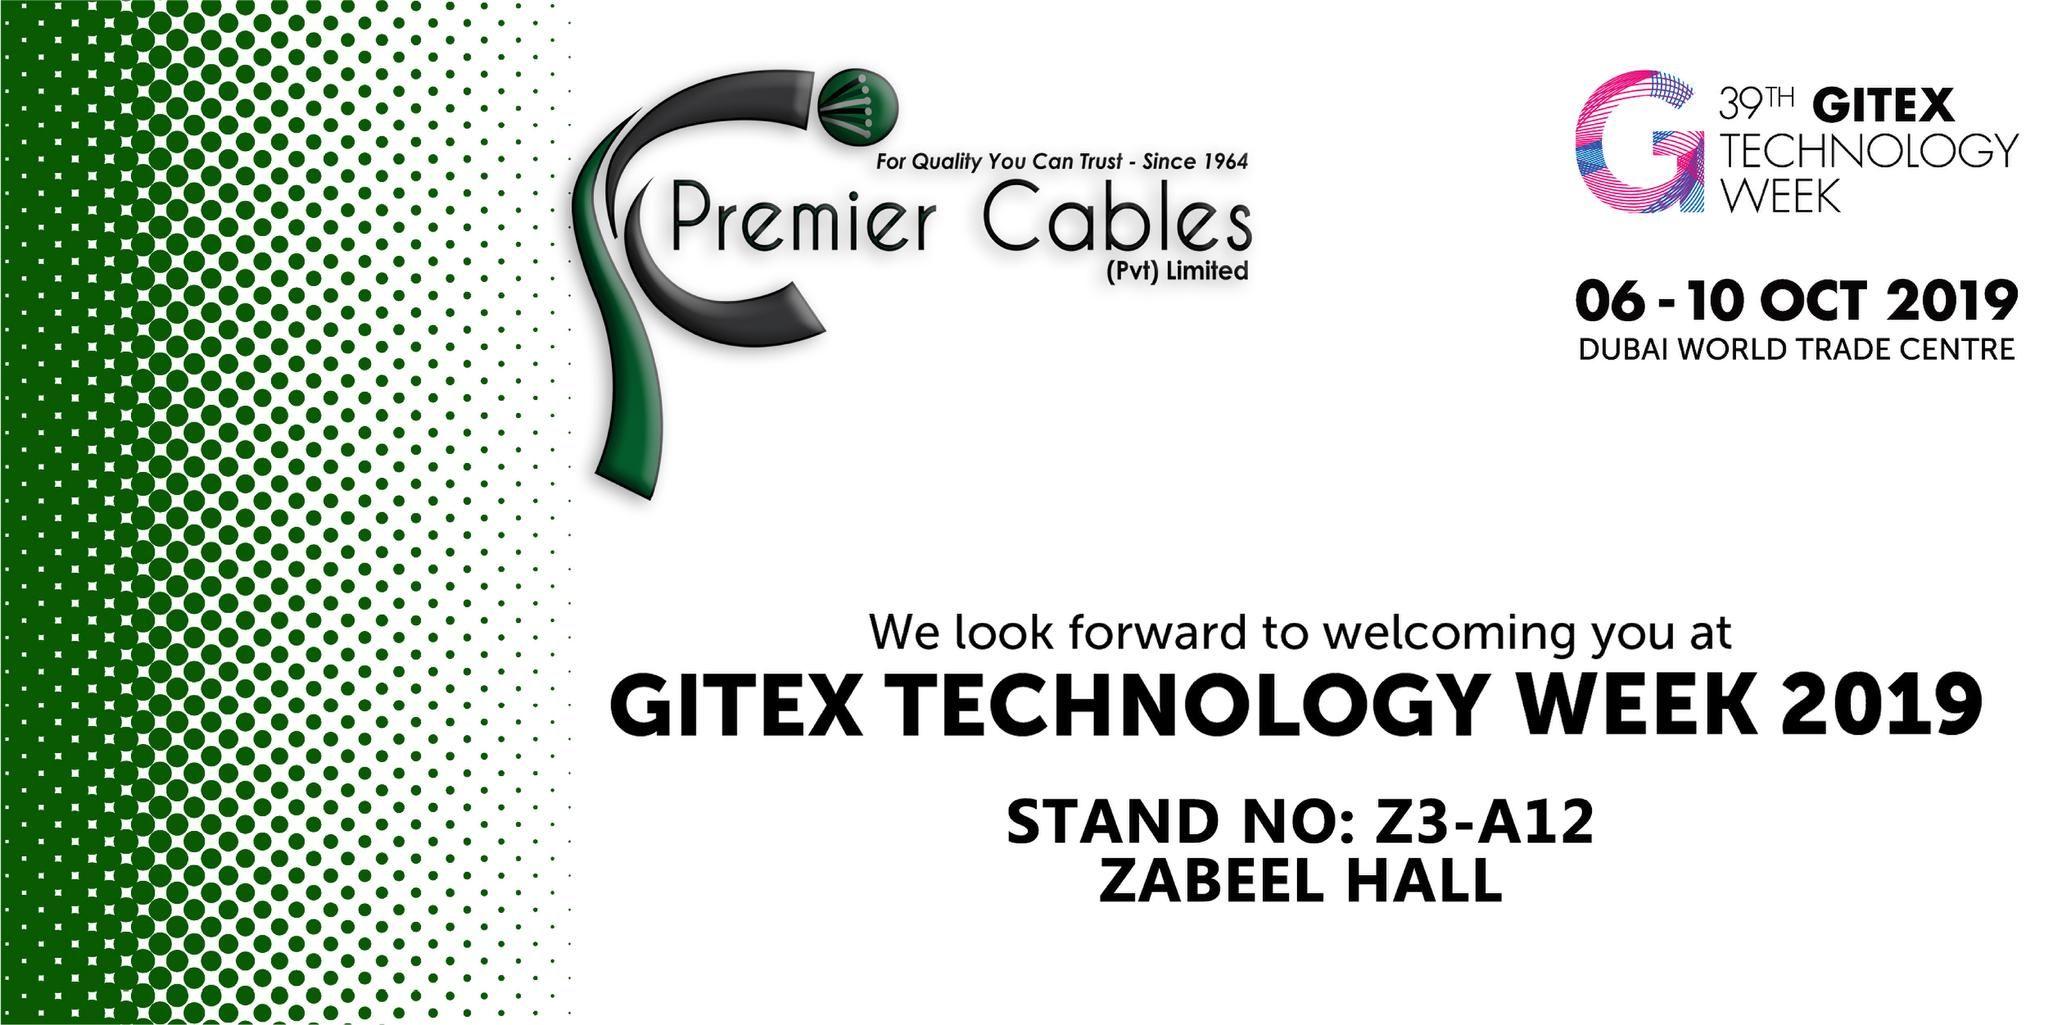 Premier Cables FZCO